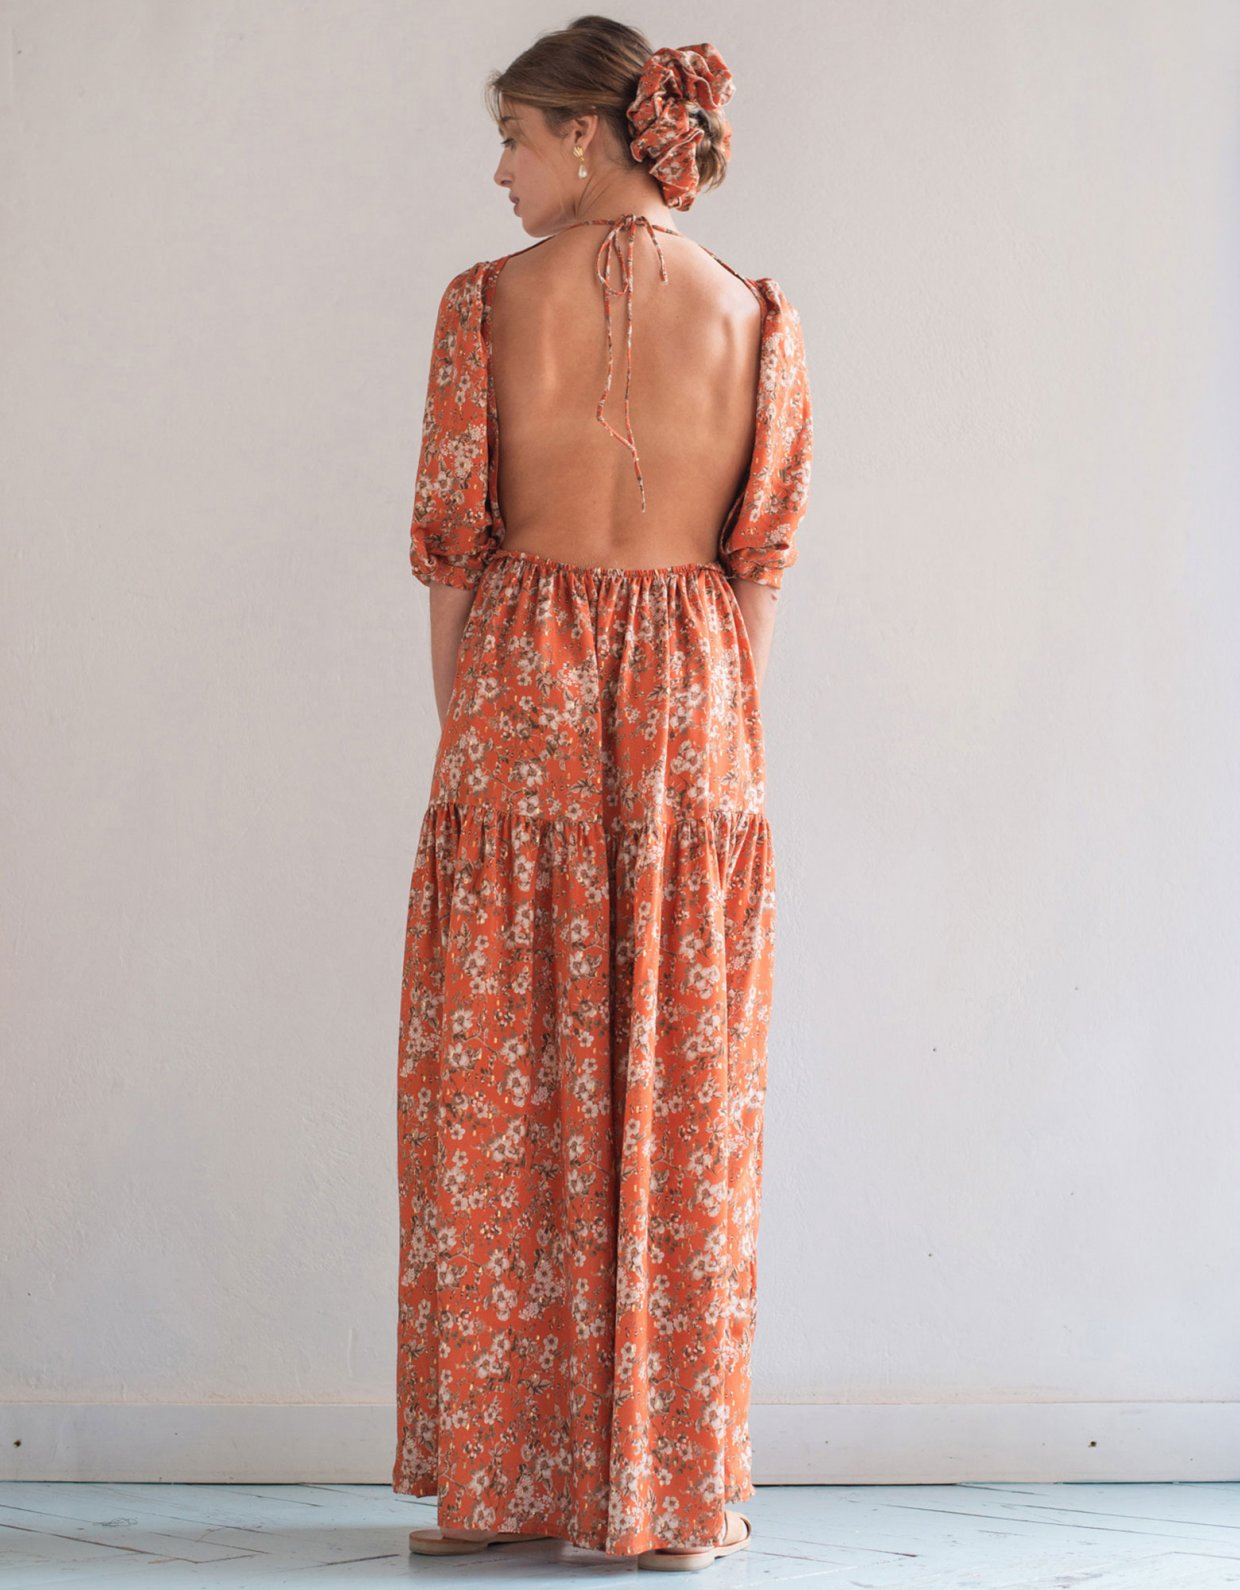 Madame Shoushou Lauter orange dress